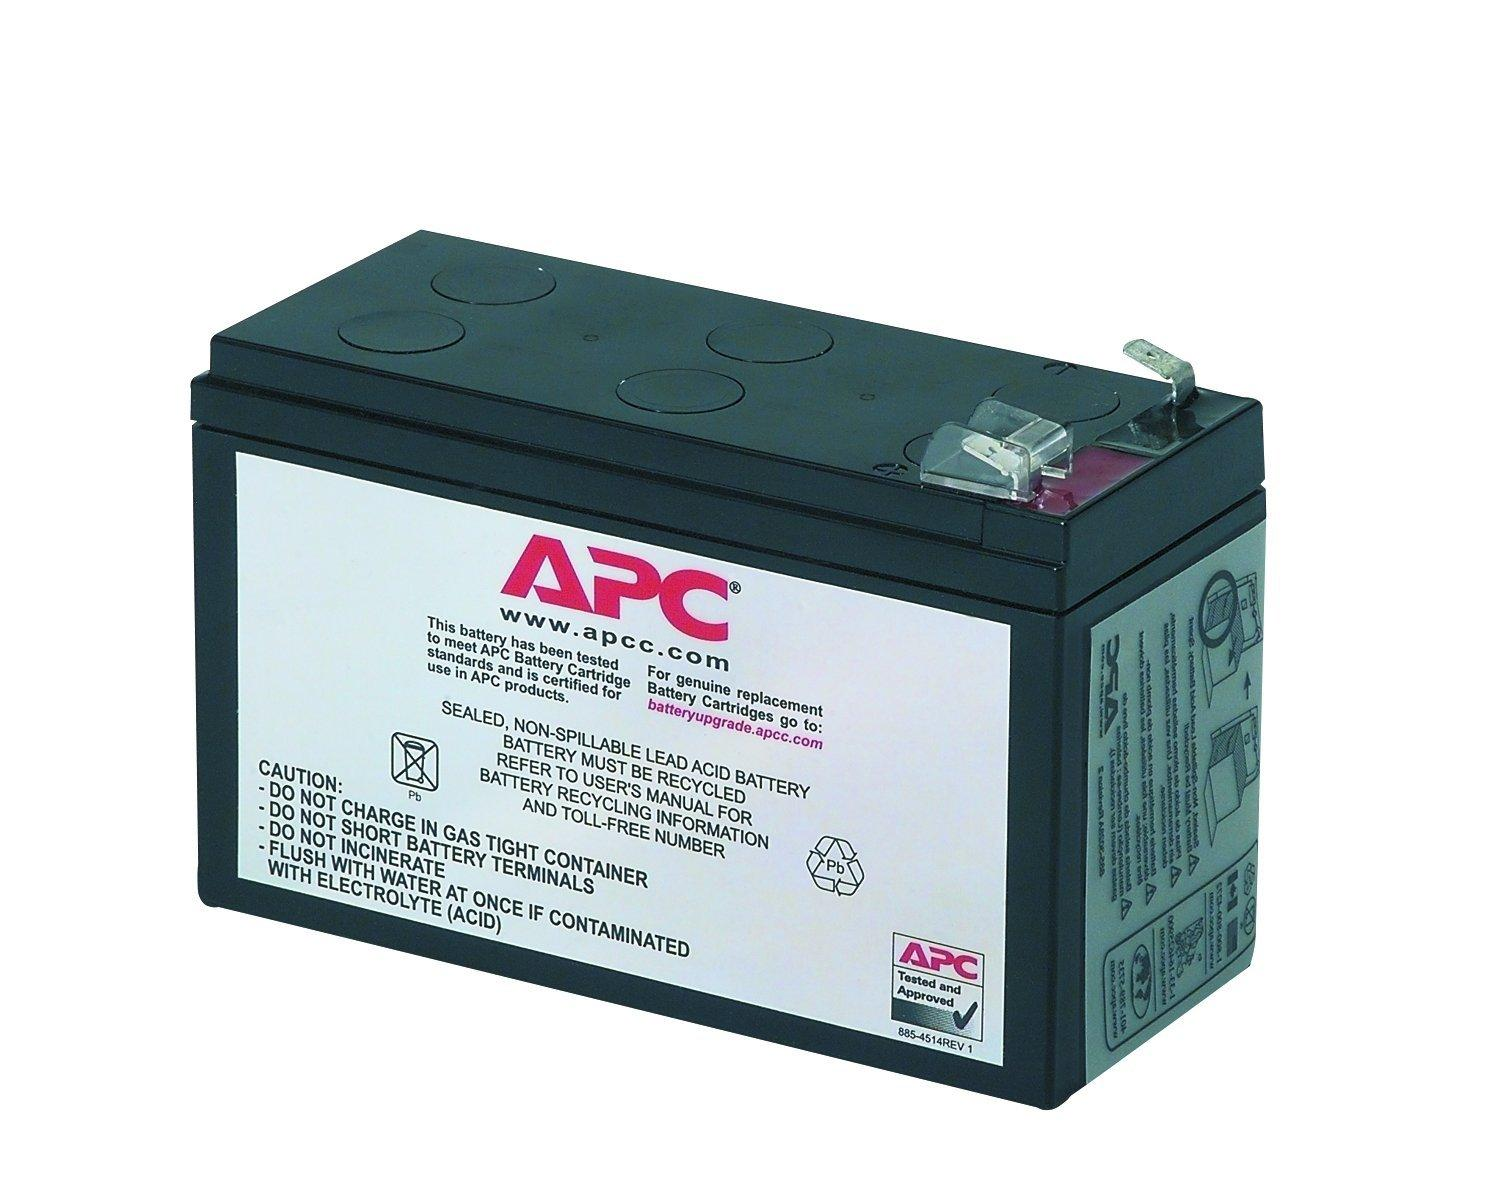 amazon com apc ups replacement battery cartridge for apc ups model rh amazon com apc es 500 user manual Apc 500 Battery Replacement